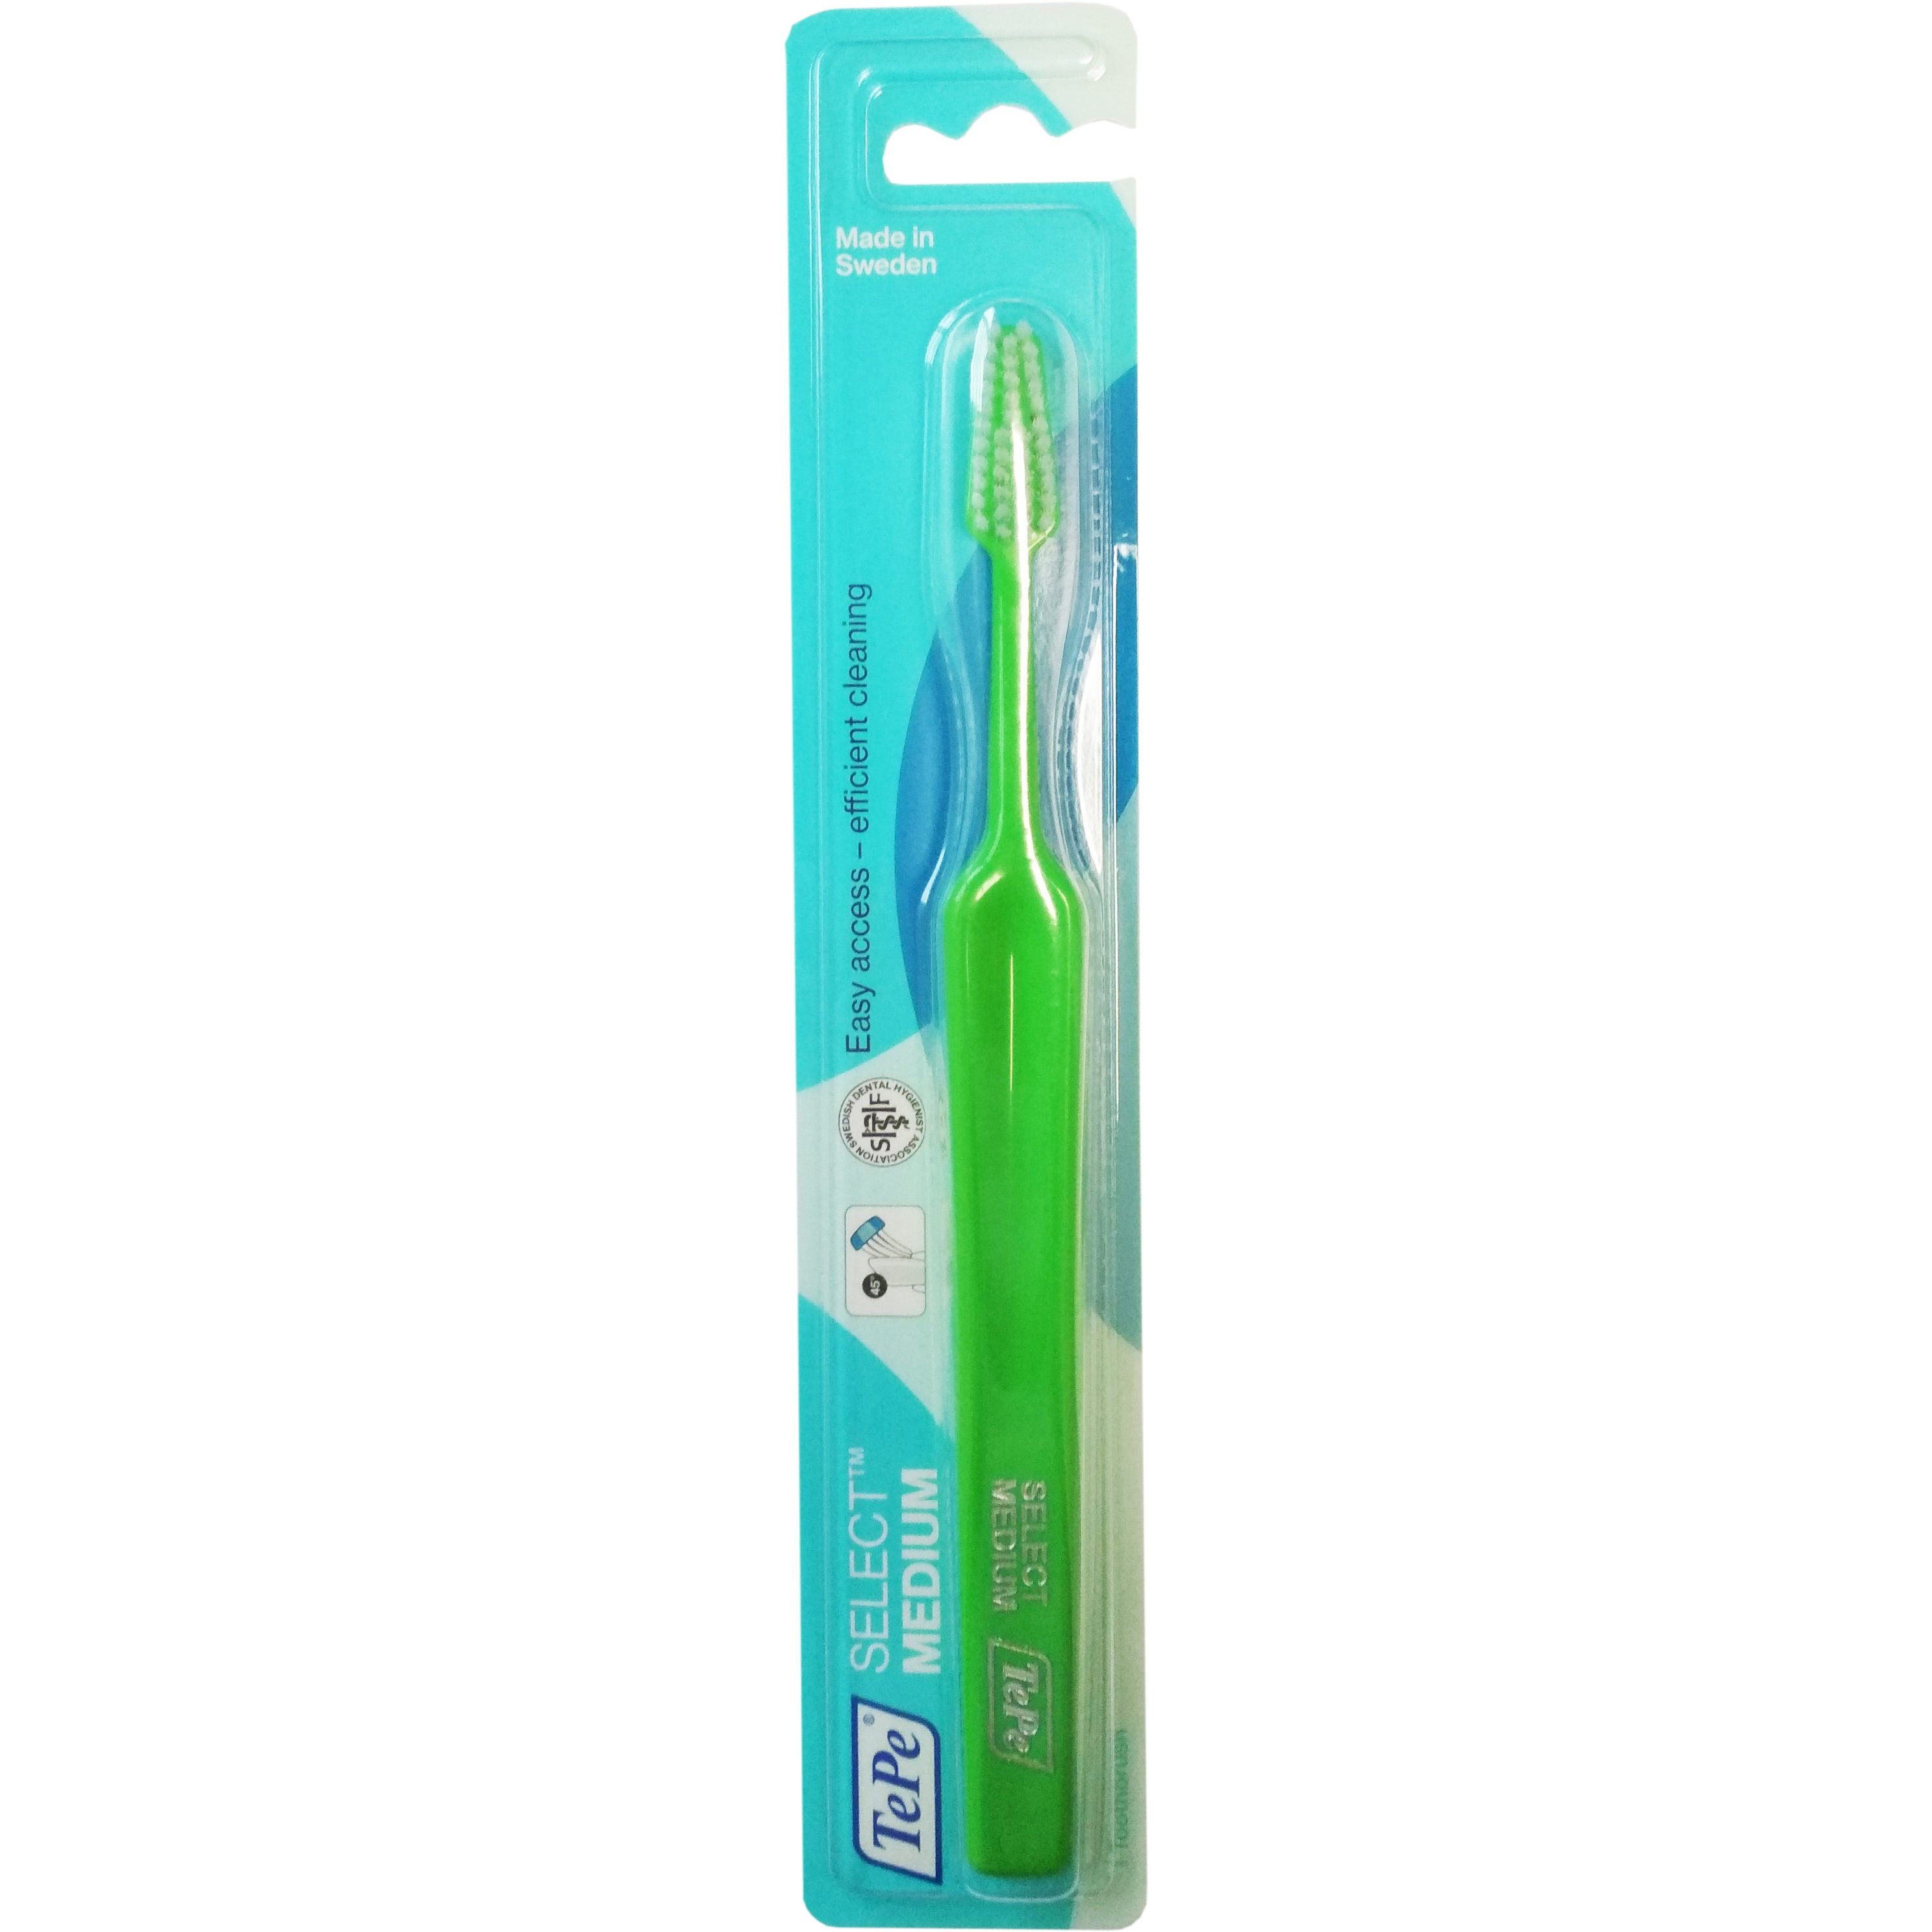 Tepe Select Medium Οδοντόβουρτσα Μέτρια για Εύκολη Πρόσβαση στα Πίσω Δόντια & Αποτελεσματικό Καθαρισμό 1 Τεμάχιο – πράσινο